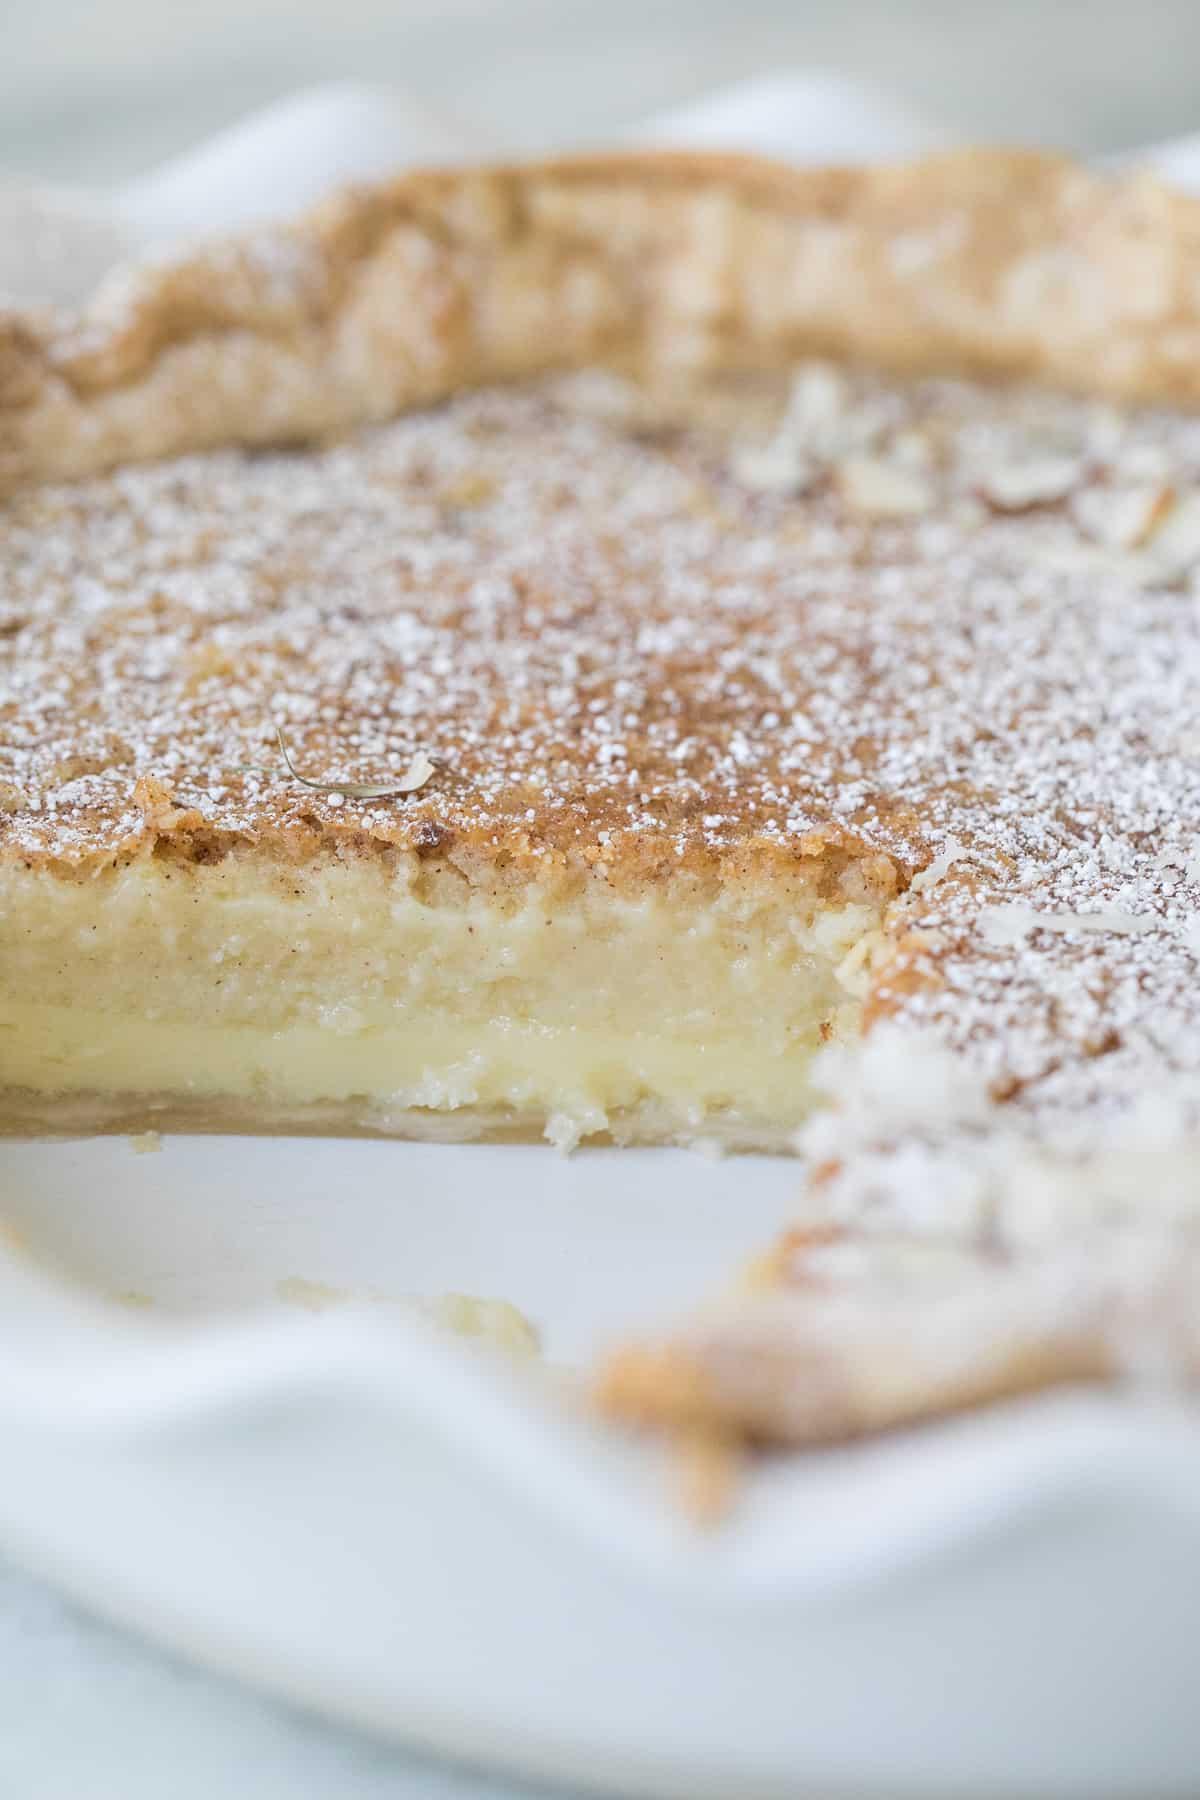 slice taken out of an egg custard pie